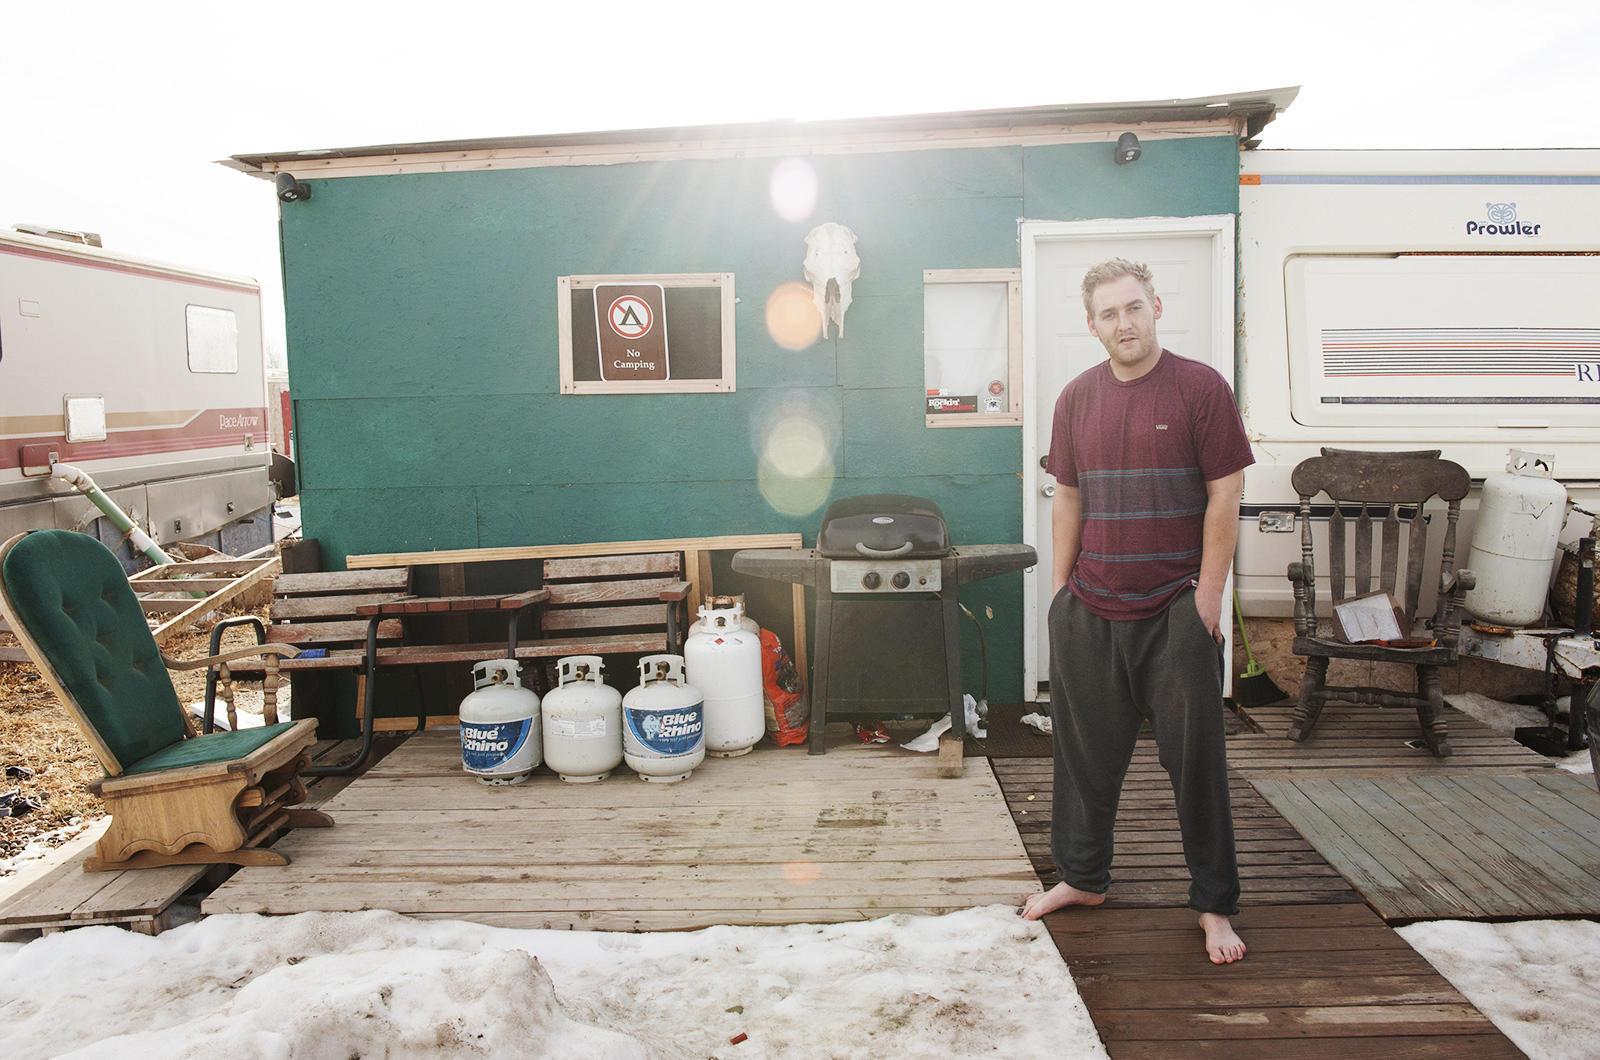 single men in dakota county Homeless in dakota county: get help, donate or volunteer is a sober homeless shelter for those men homelessness rates in dakota county and other suburban.